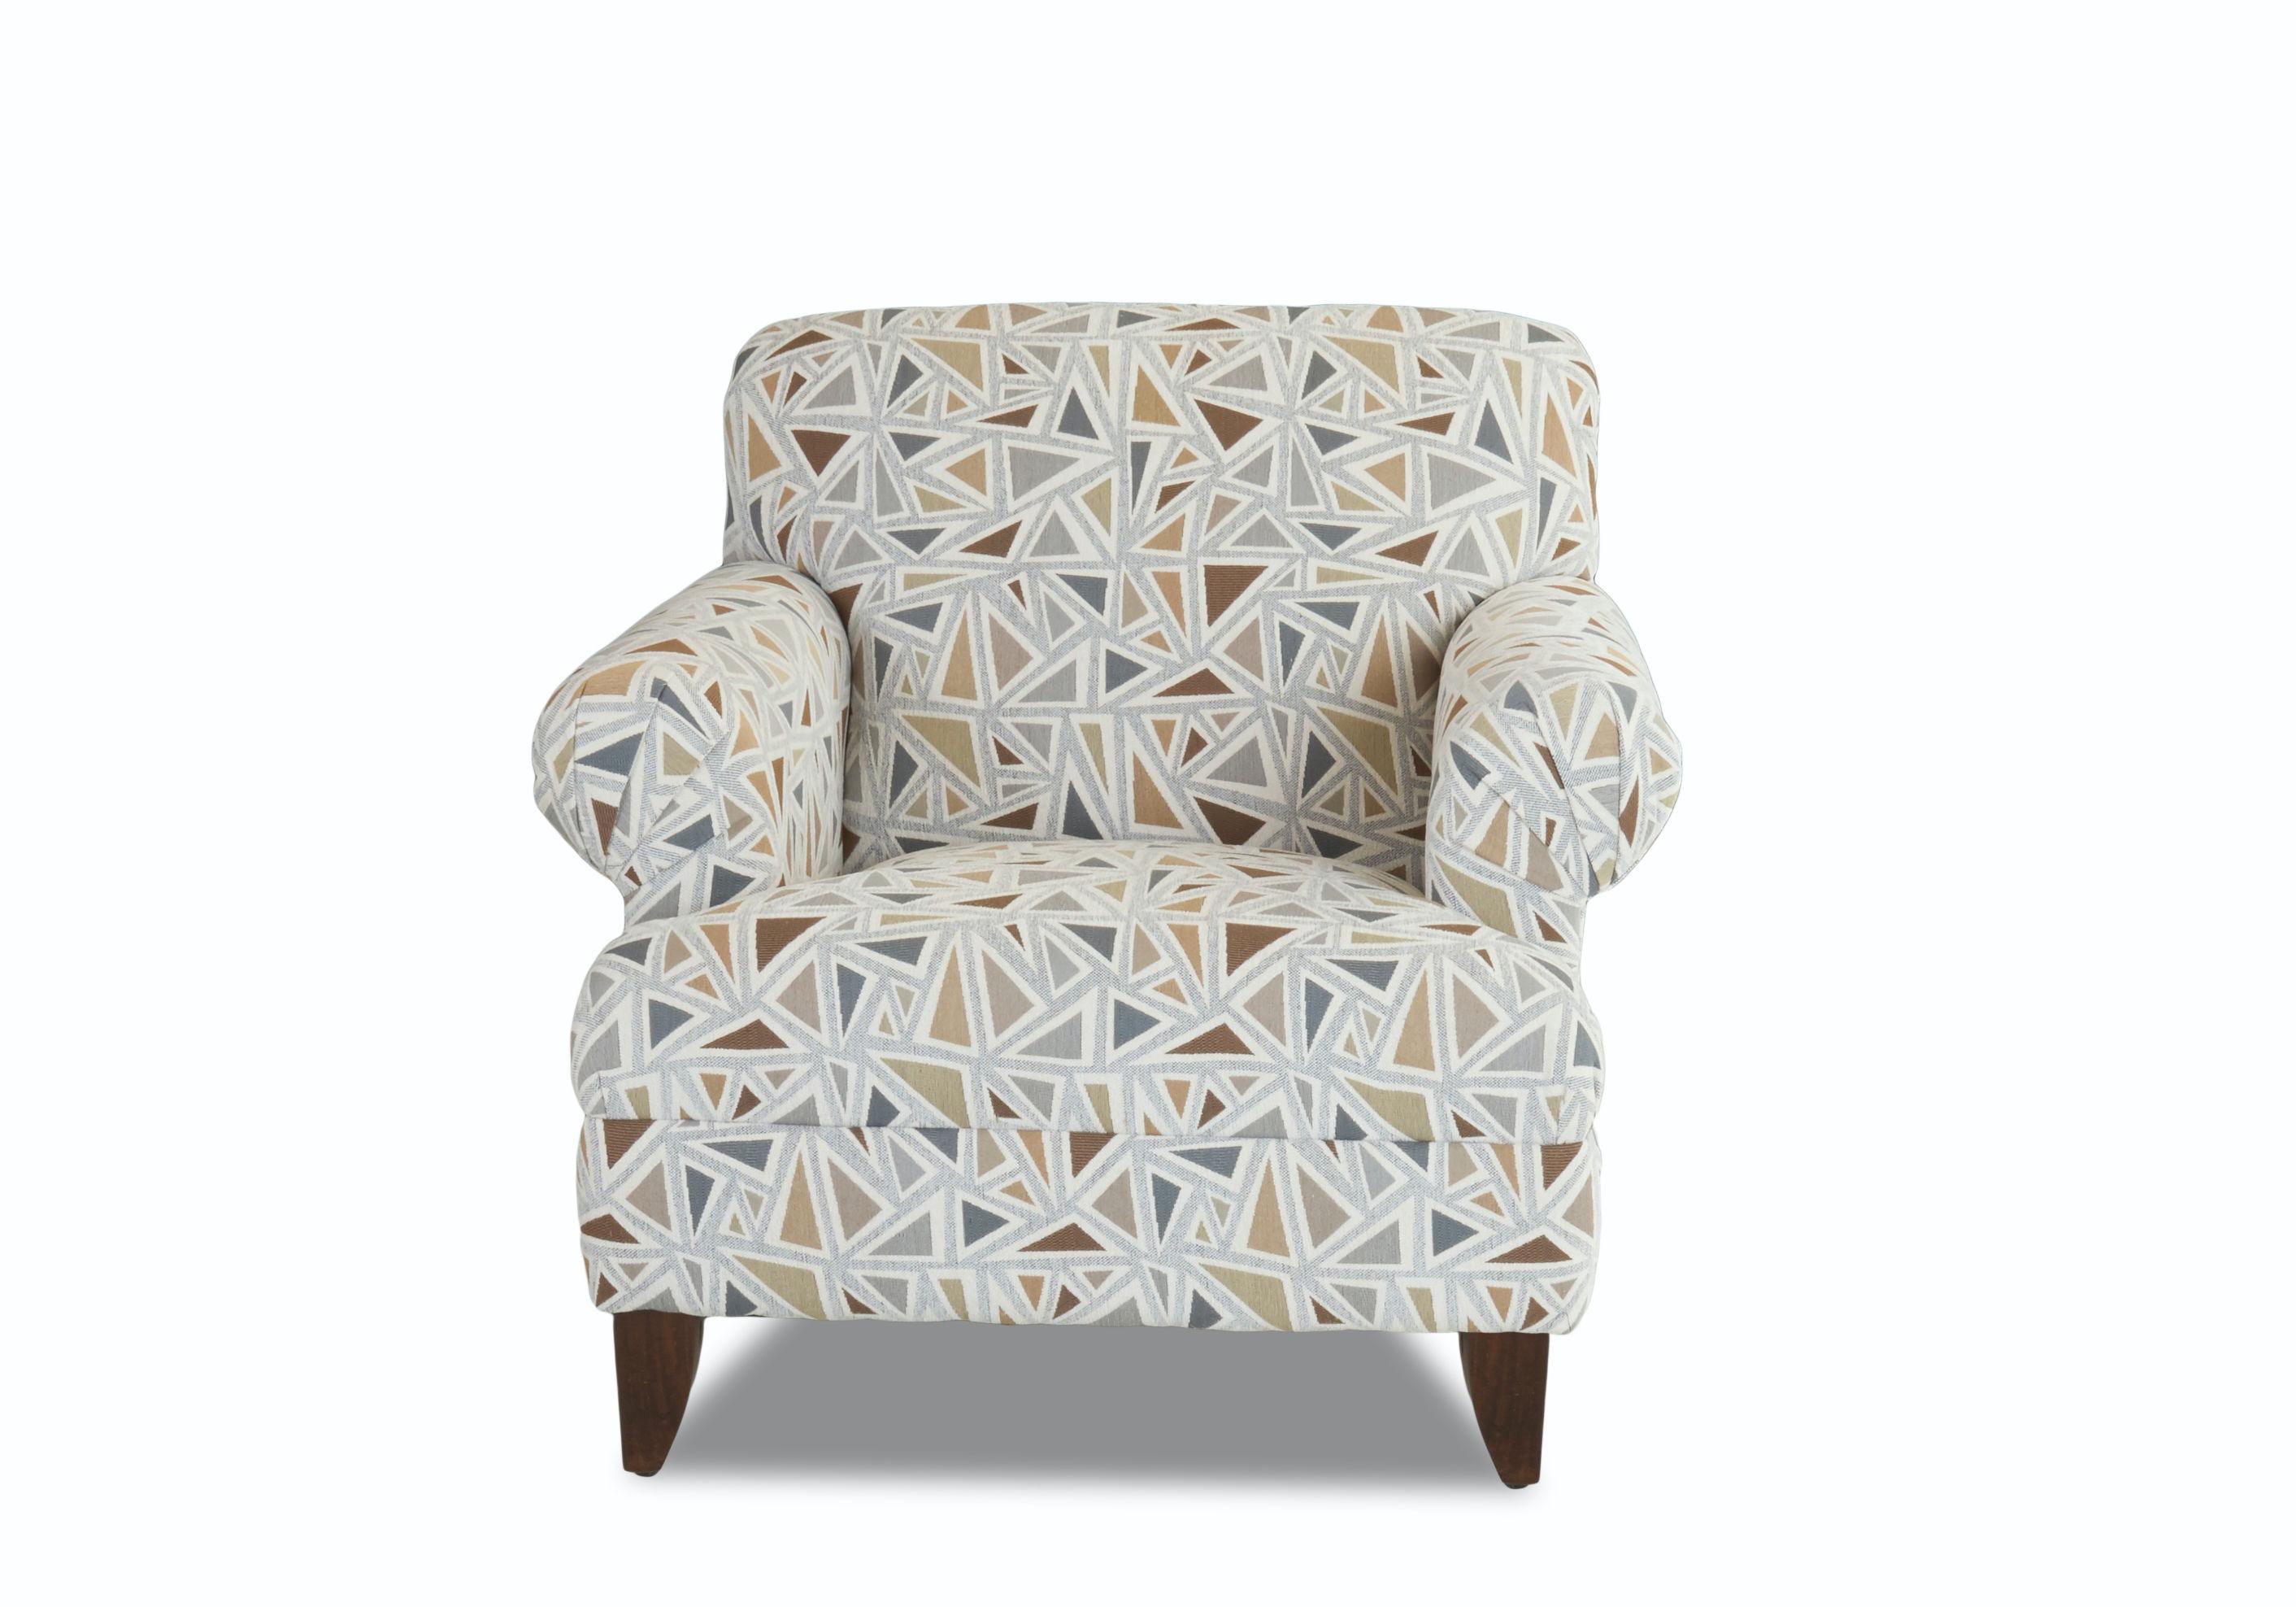 Klaussner Living Room Sheldon 260 C Indiana Furniture And Mattress Valparaiso  In